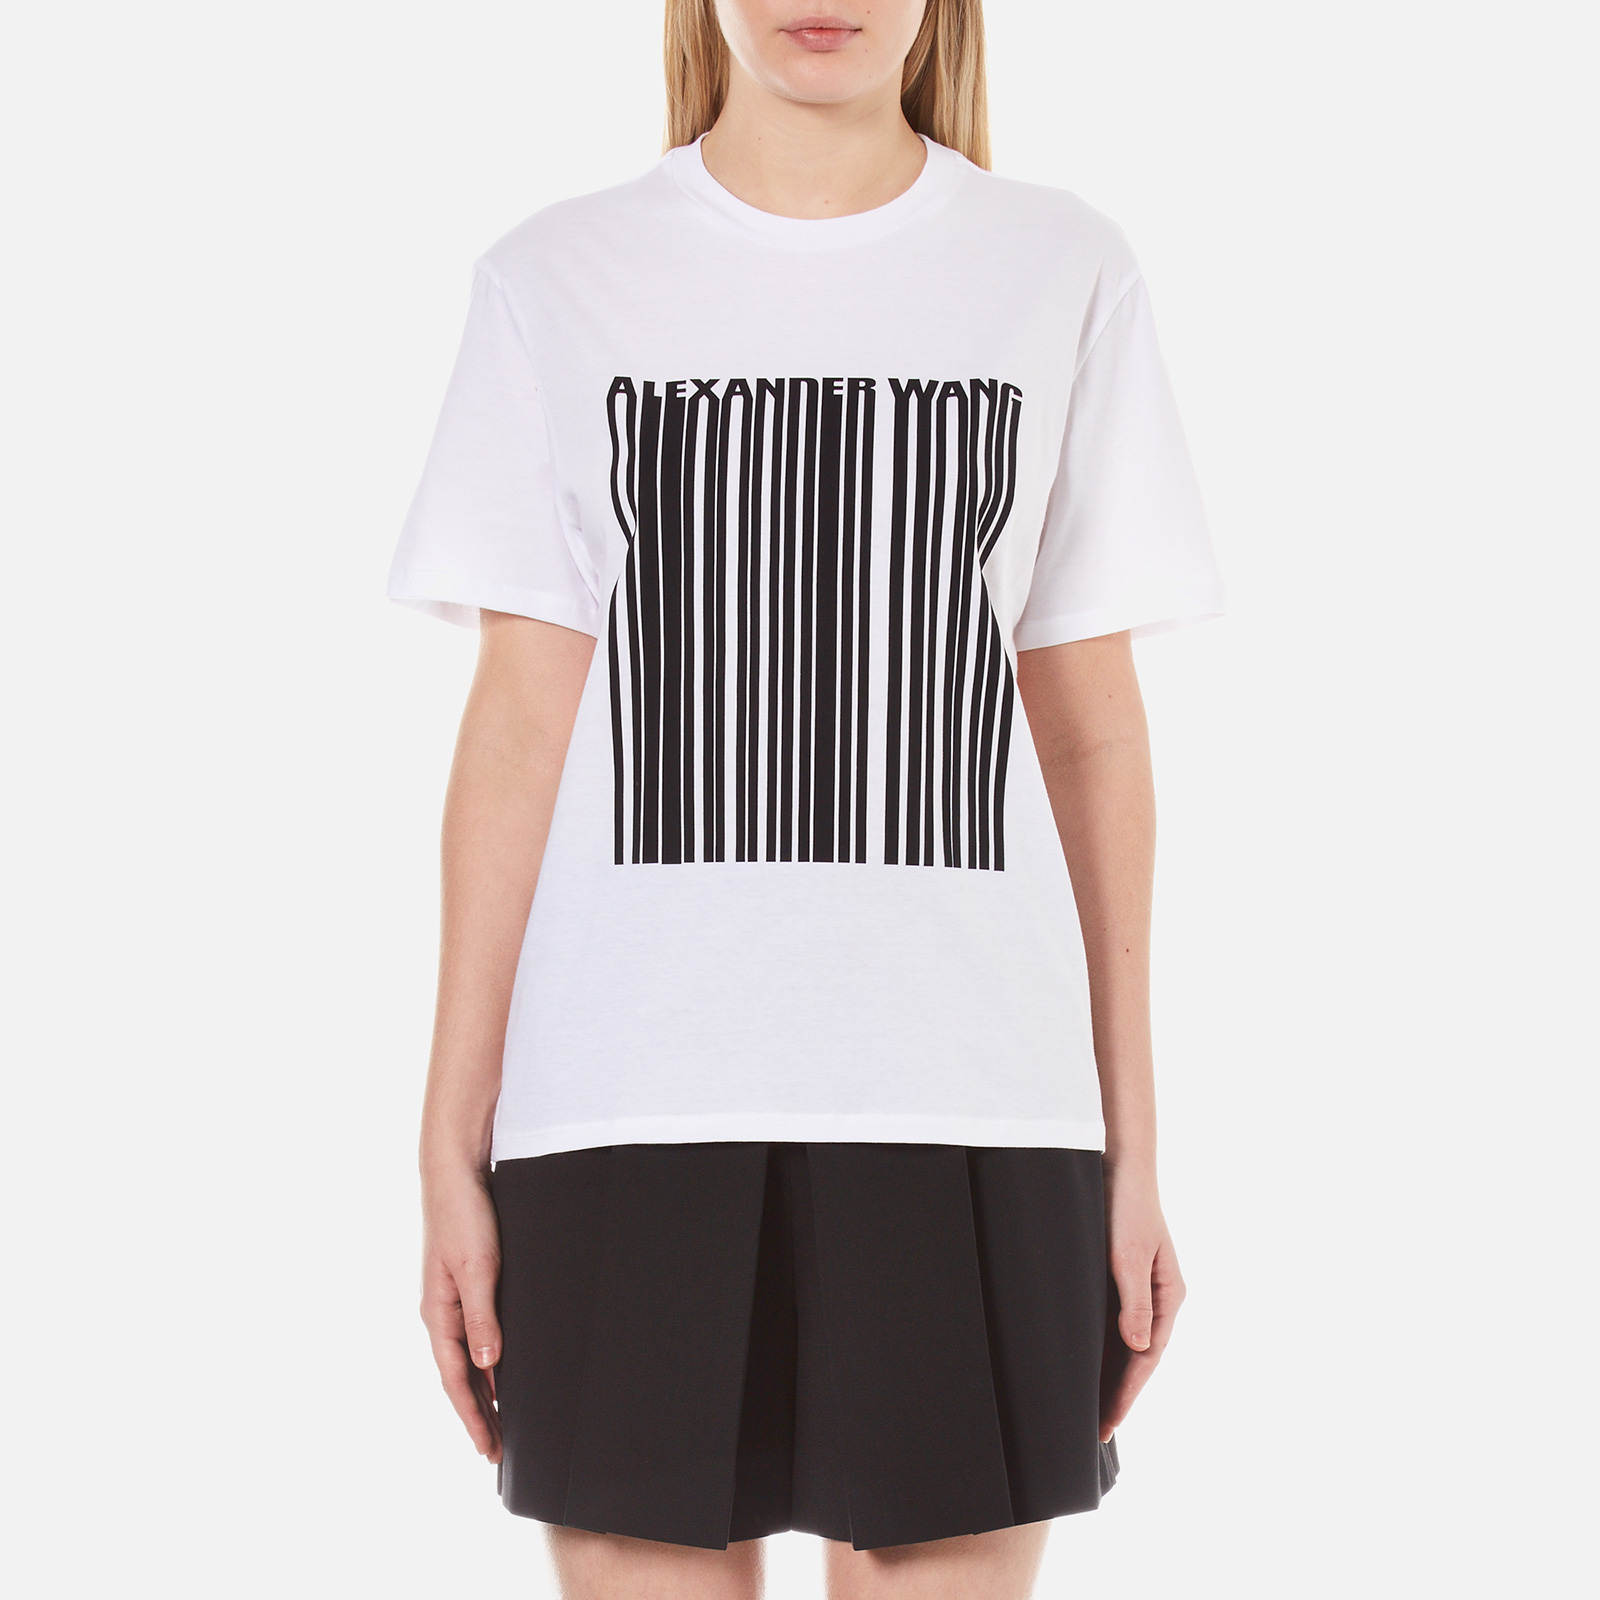 856a321e158e9e Alexander Wang Women's Bonded Barcode Boxy Crew Neck T-Shirt - Bleach -  Free UK Delivery over £50